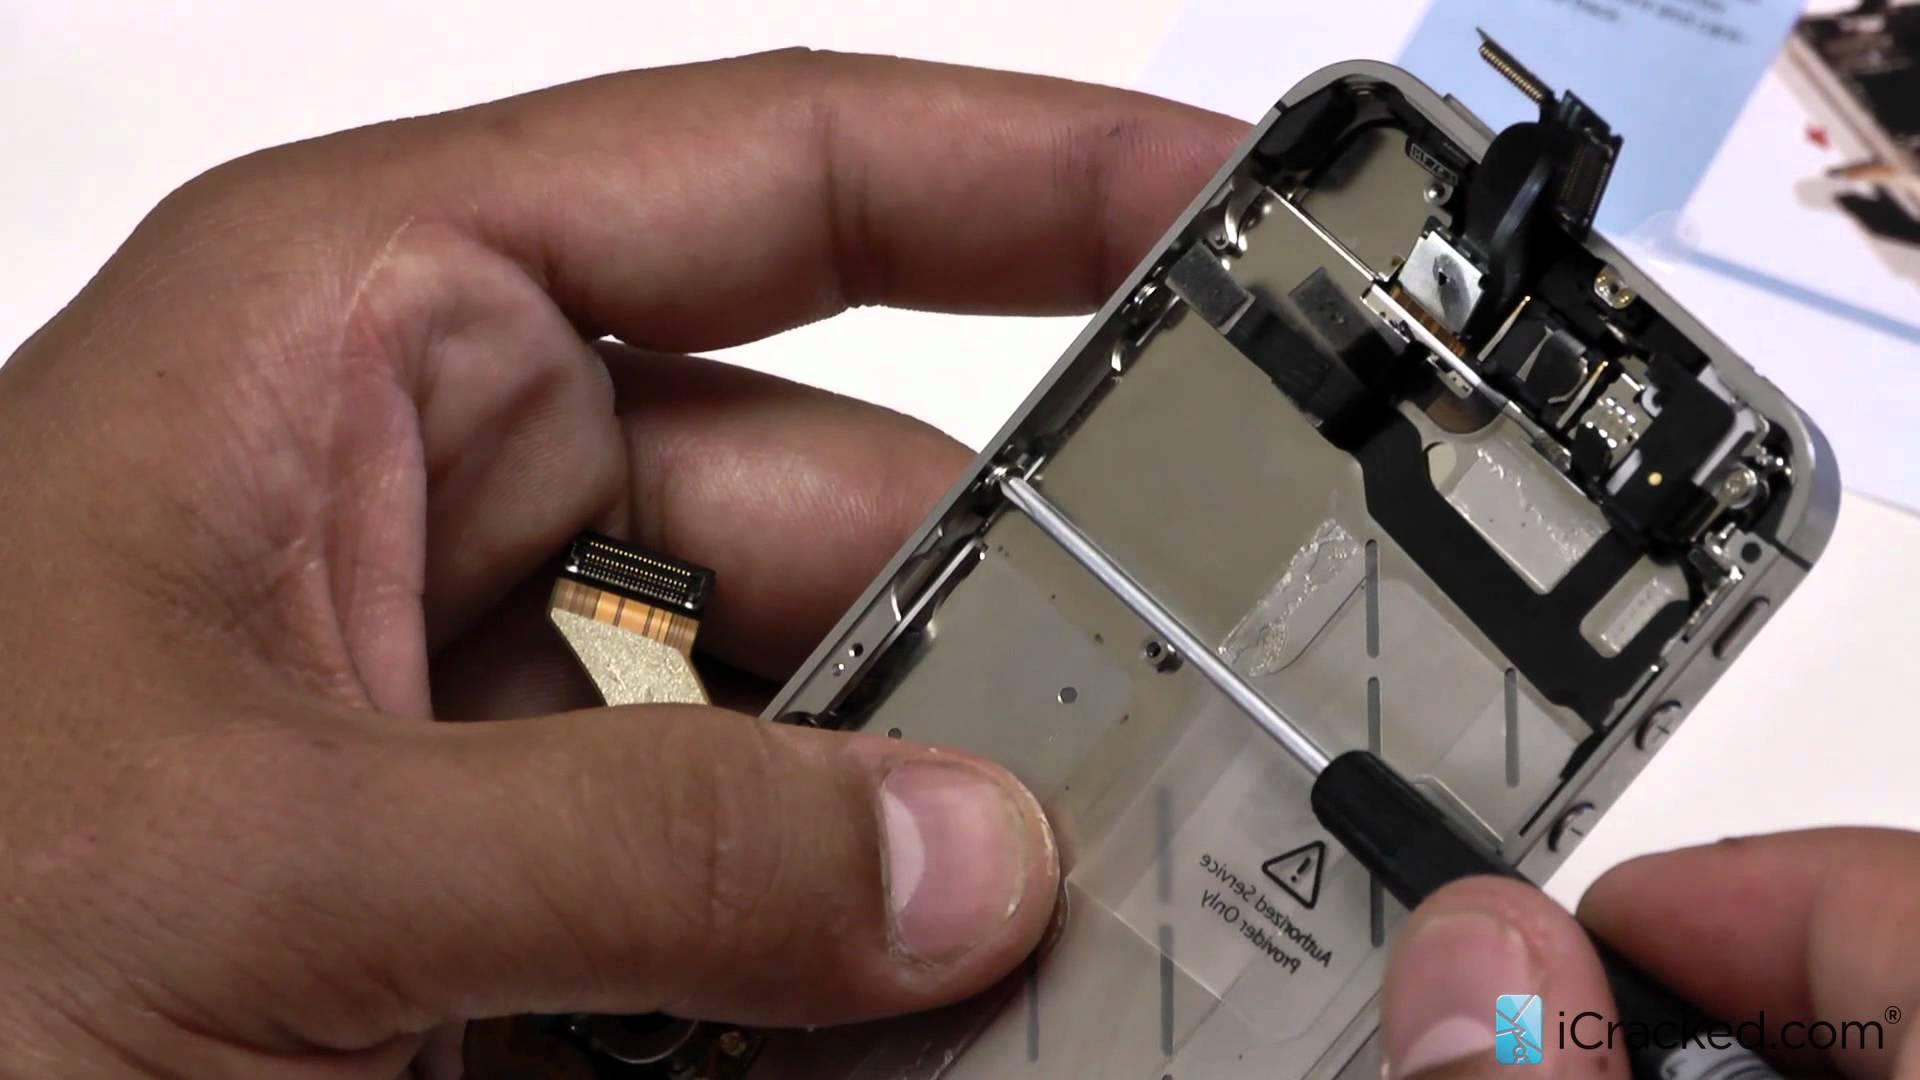 iPhone4s フロントパネル交換修理・取りつけ方法動画